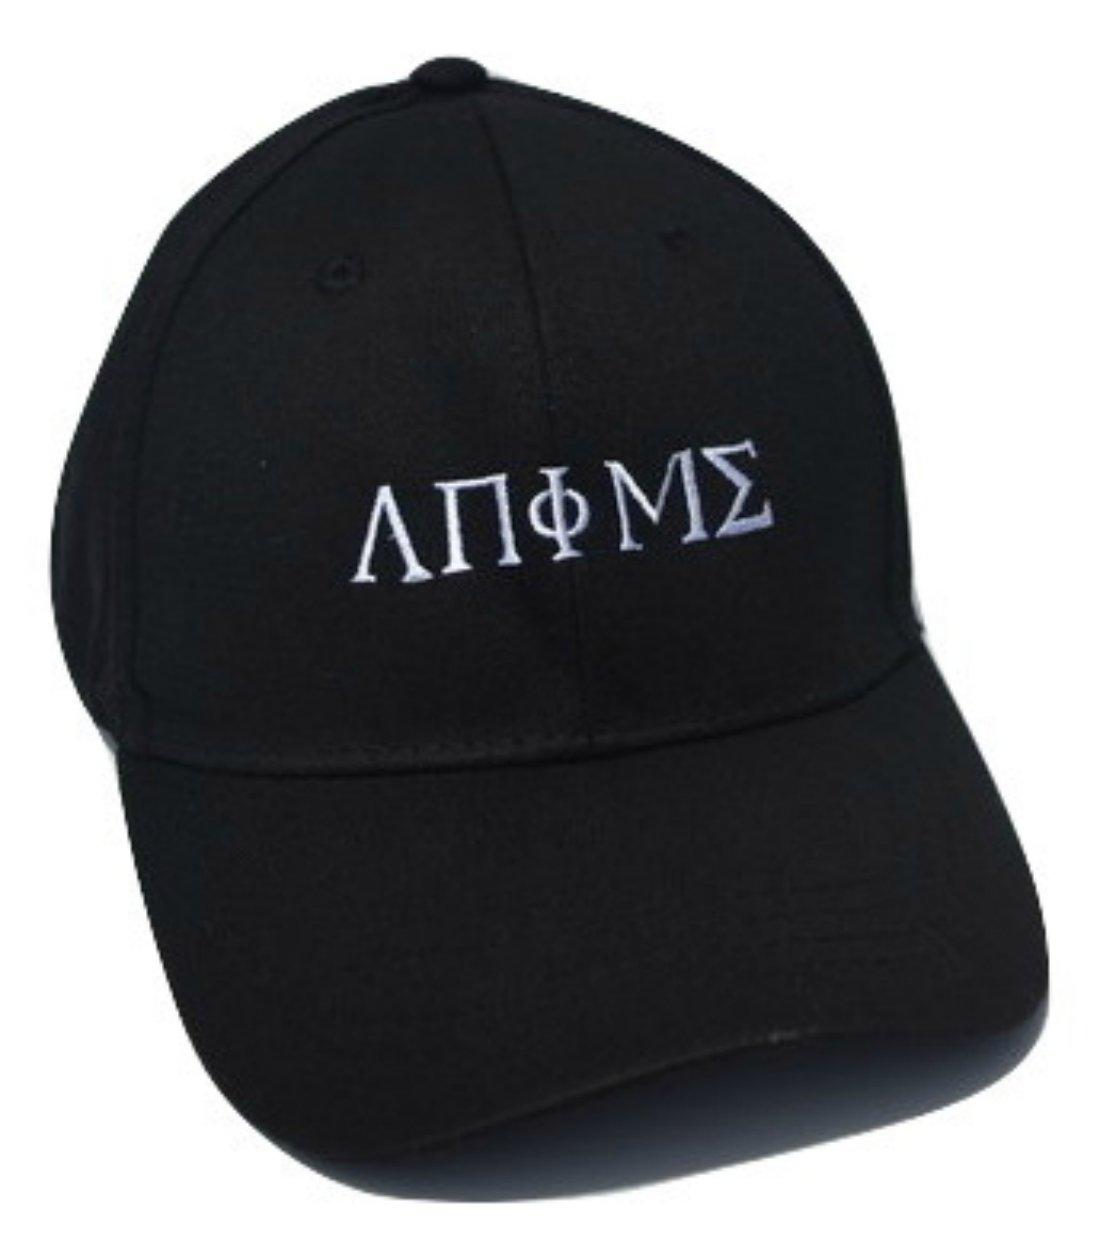 Variable Outpost Anime Greek Lettering Style Adjustable Hat (Black)